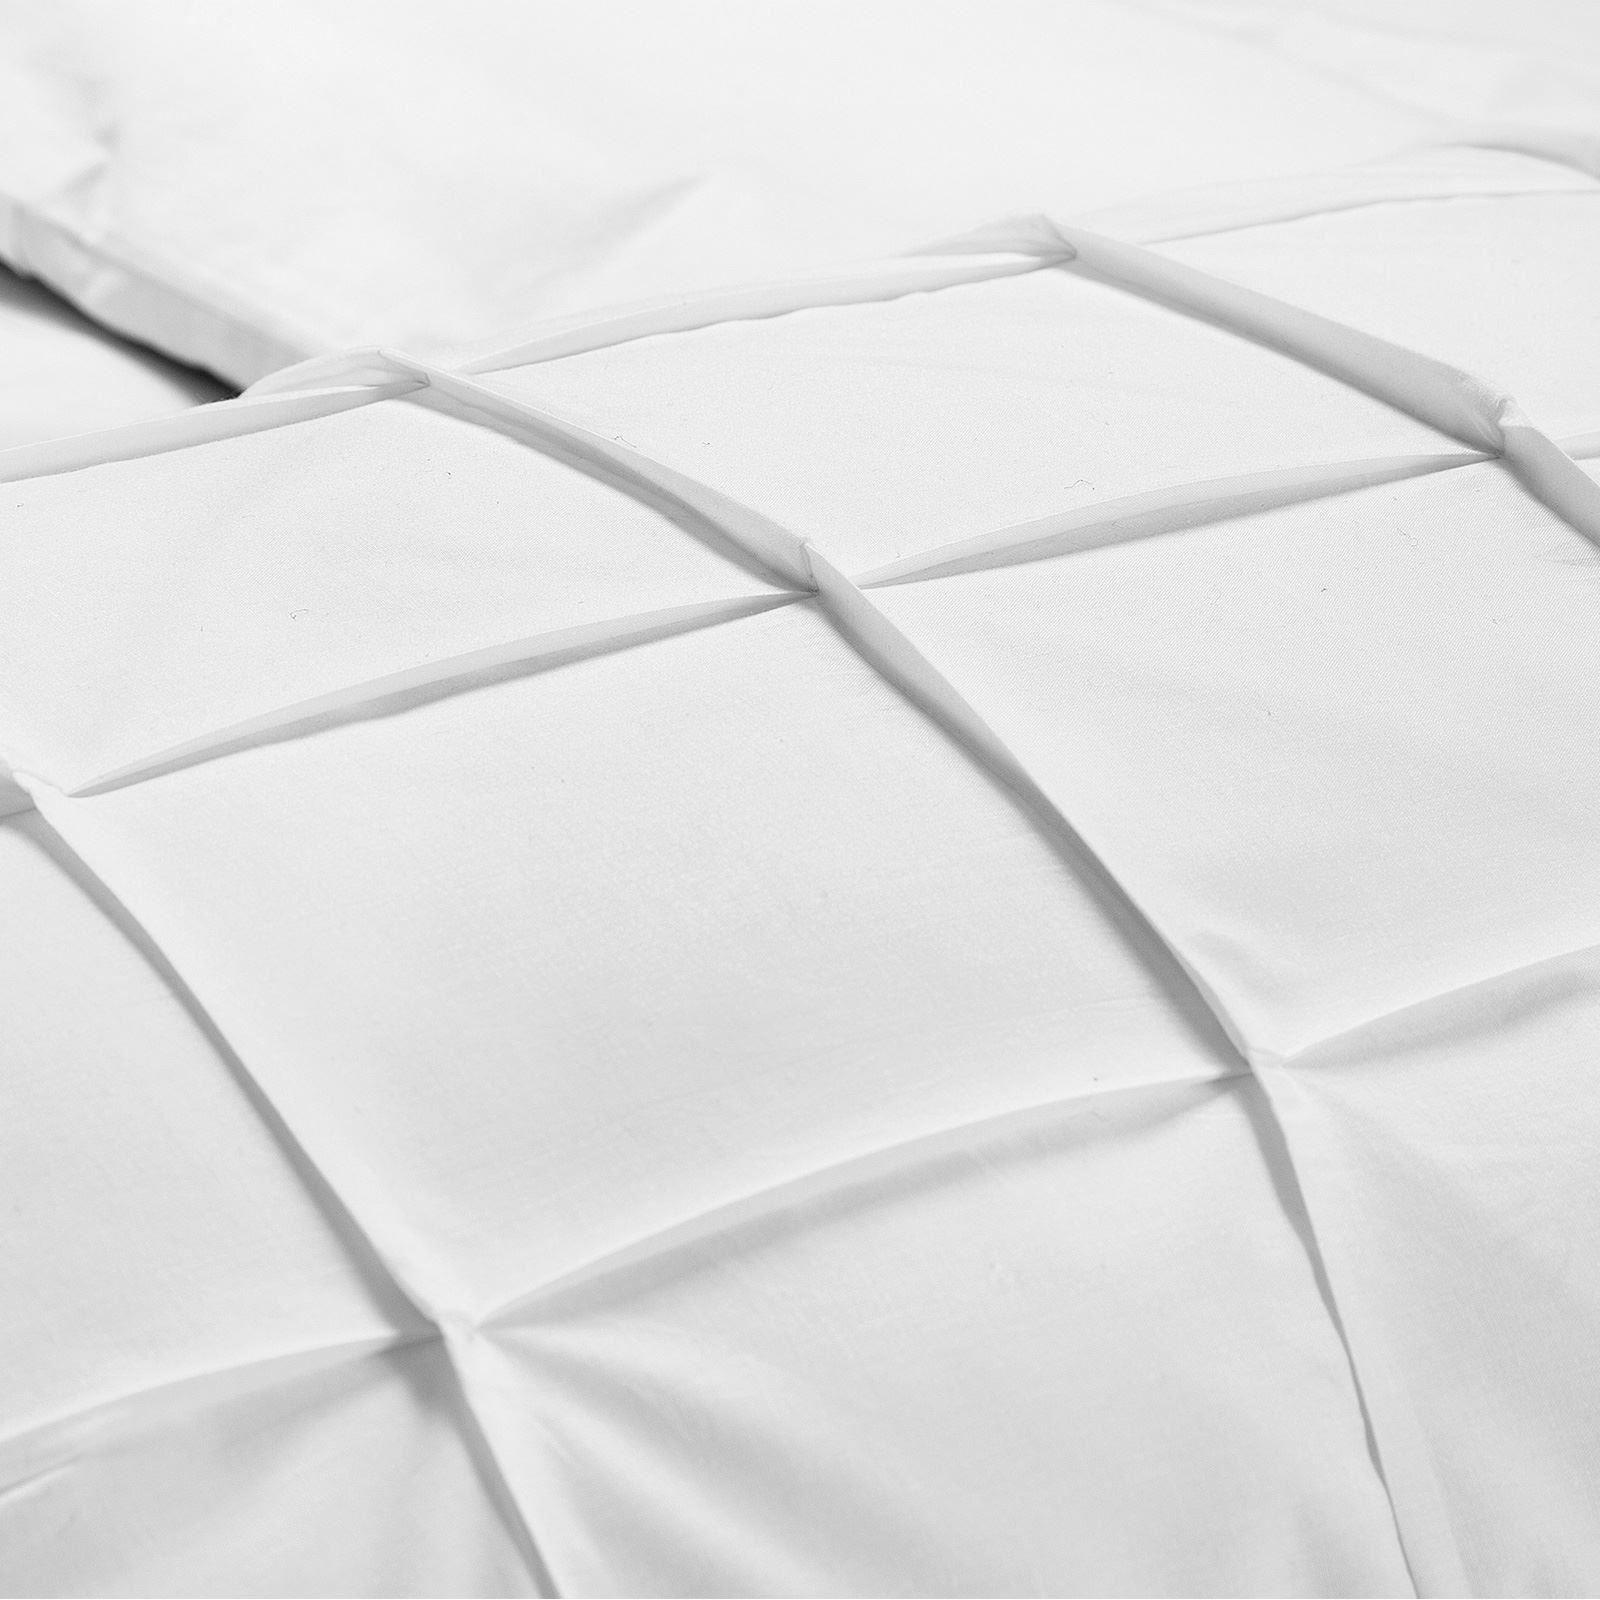 Cartier-Quilt-Duvet-Cover-Bedding-Set-Soft-100-Egyptian-Cotton-Pintuck-Pleated thumbnail 16